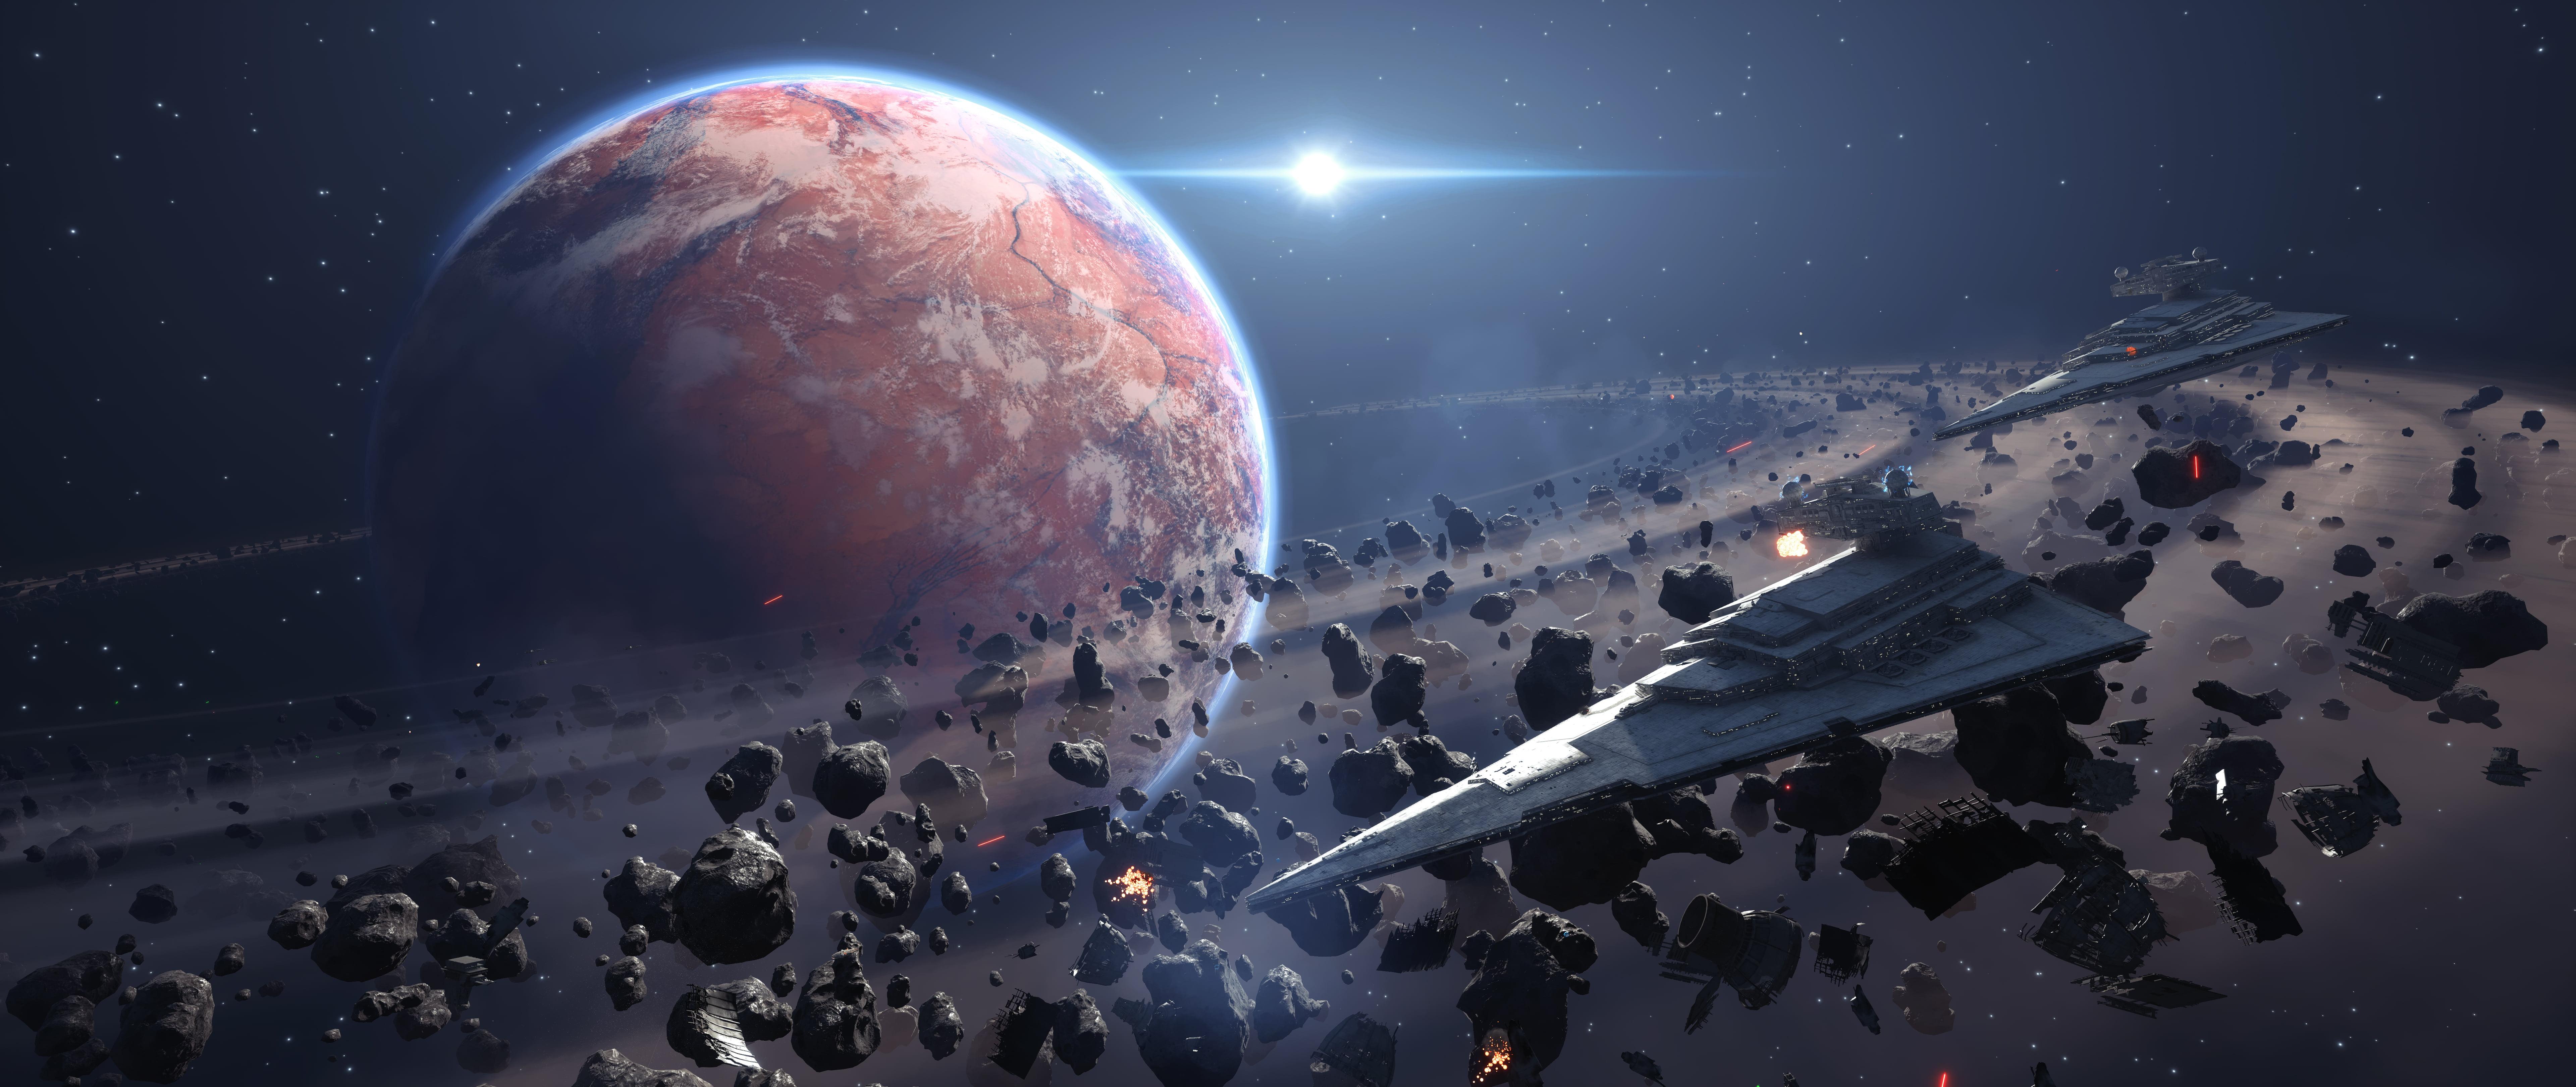 Saturn planet illustration, Star Wars Battlefront, Star